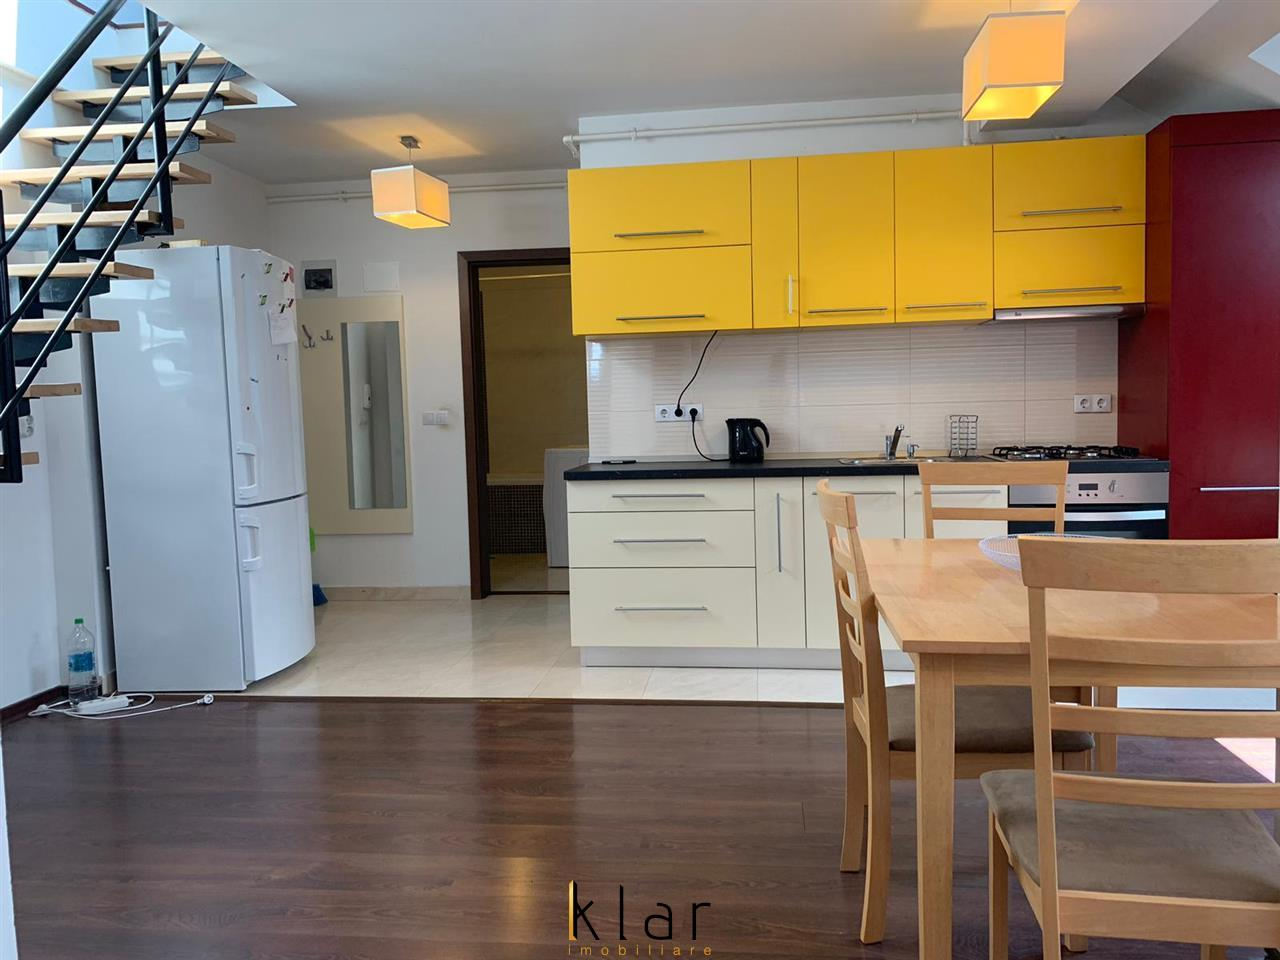 Apartament 4 camere 92mp,parcare, Zorilor, zona Profi, DISP 01-AUG-21